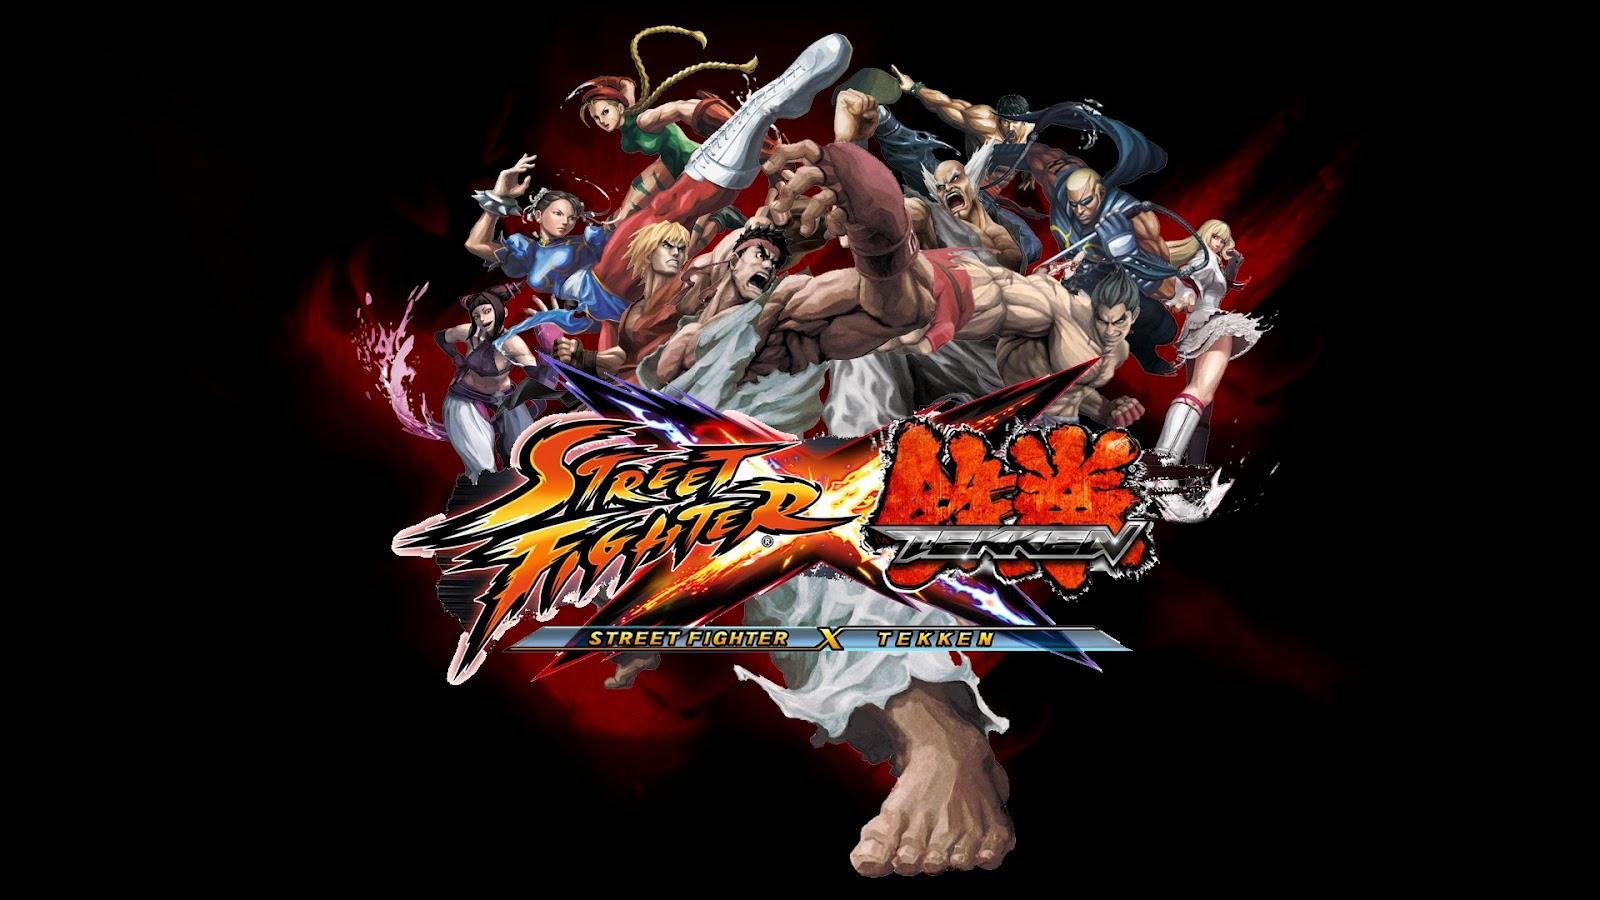 Street Fighter X Tekken wallpaper 4